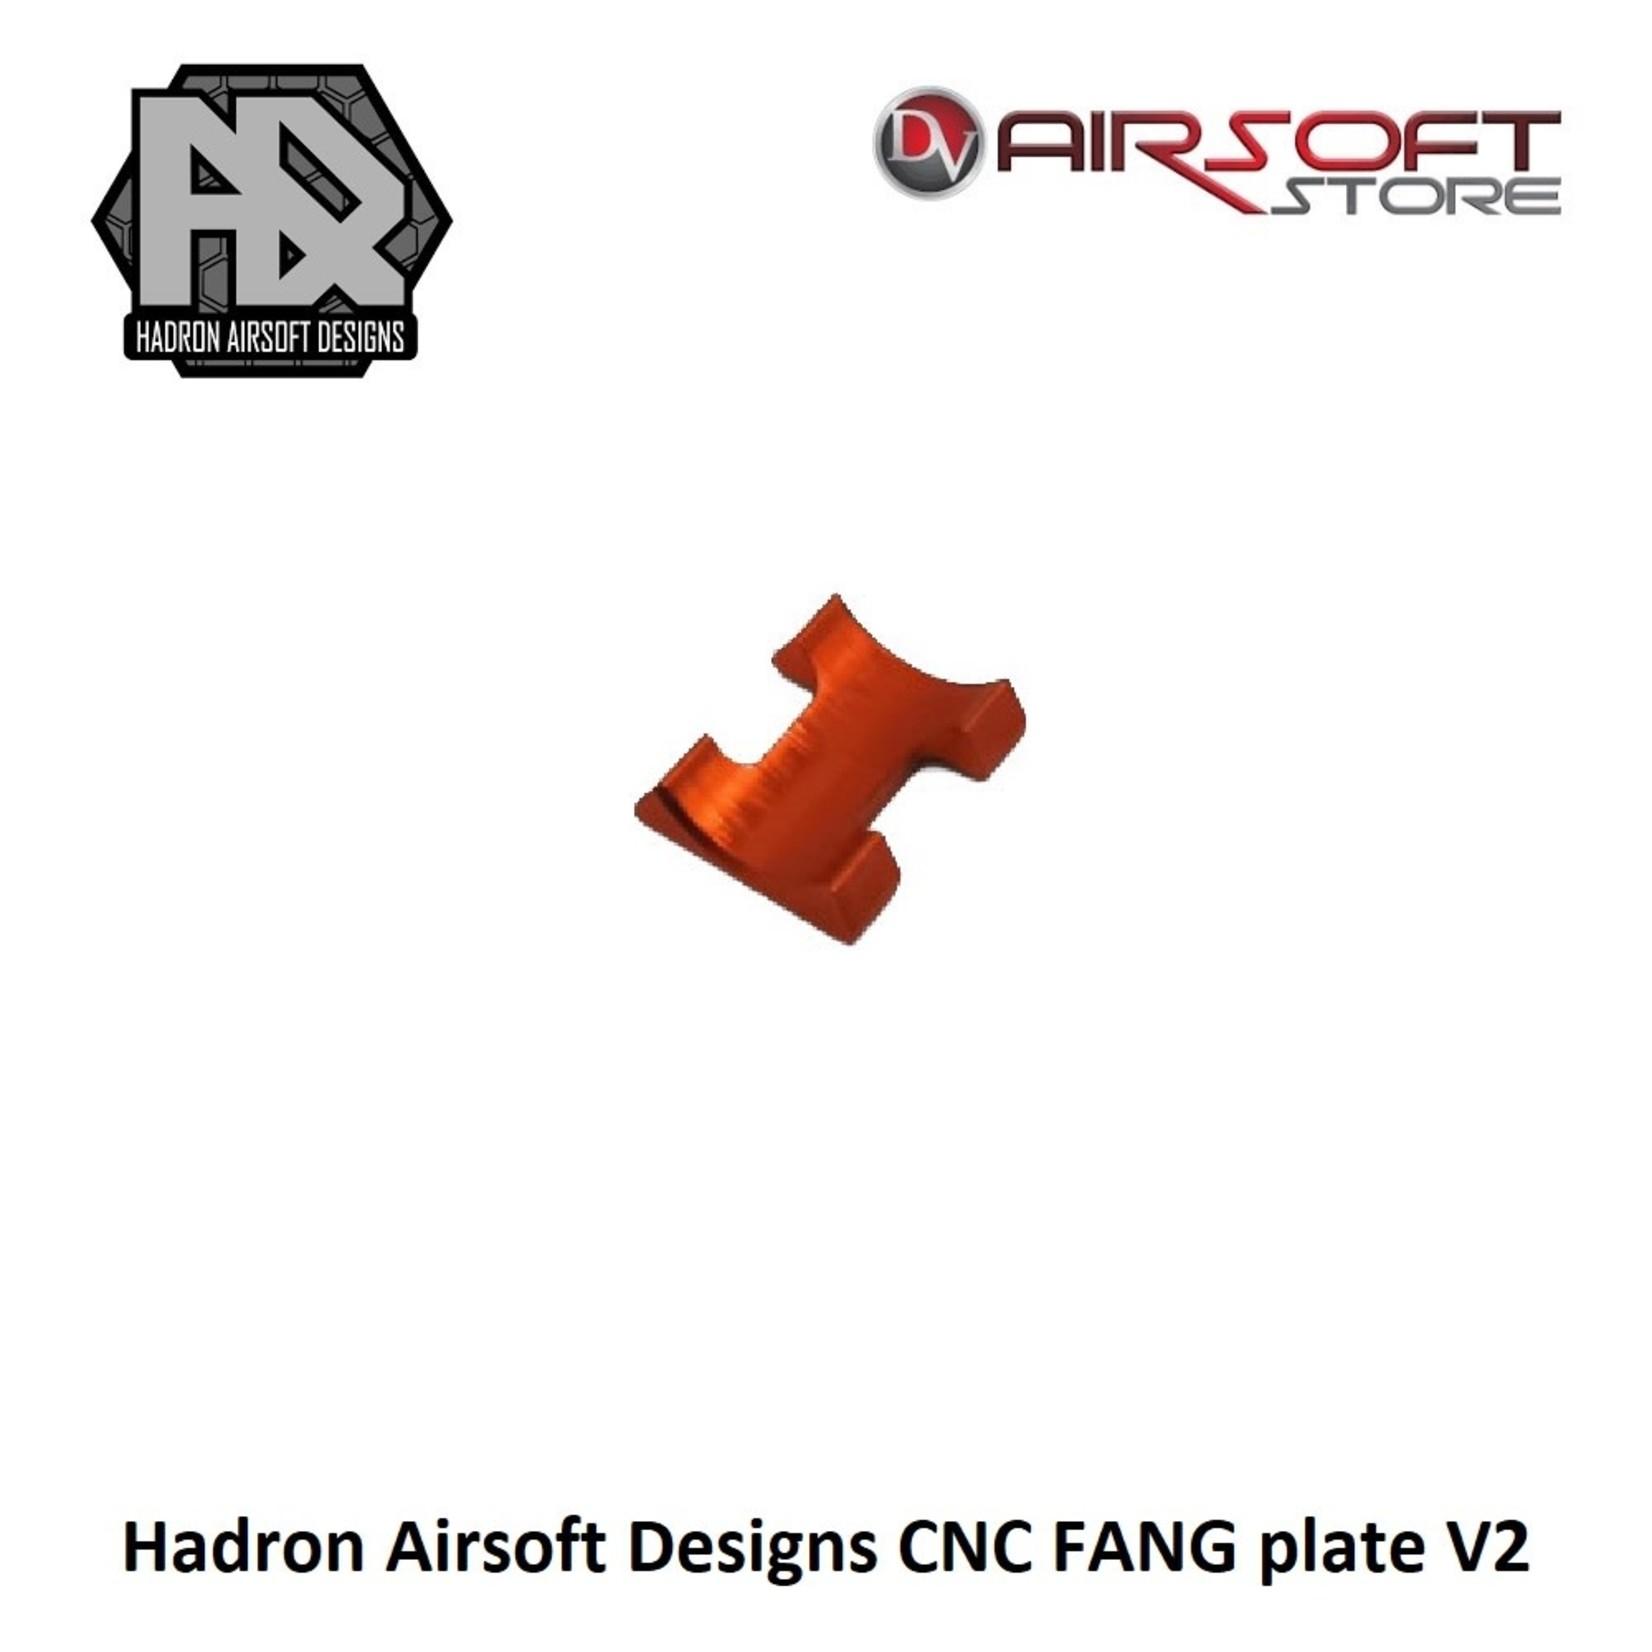 Hadron Airsoft Designs CNC FANG plate V2